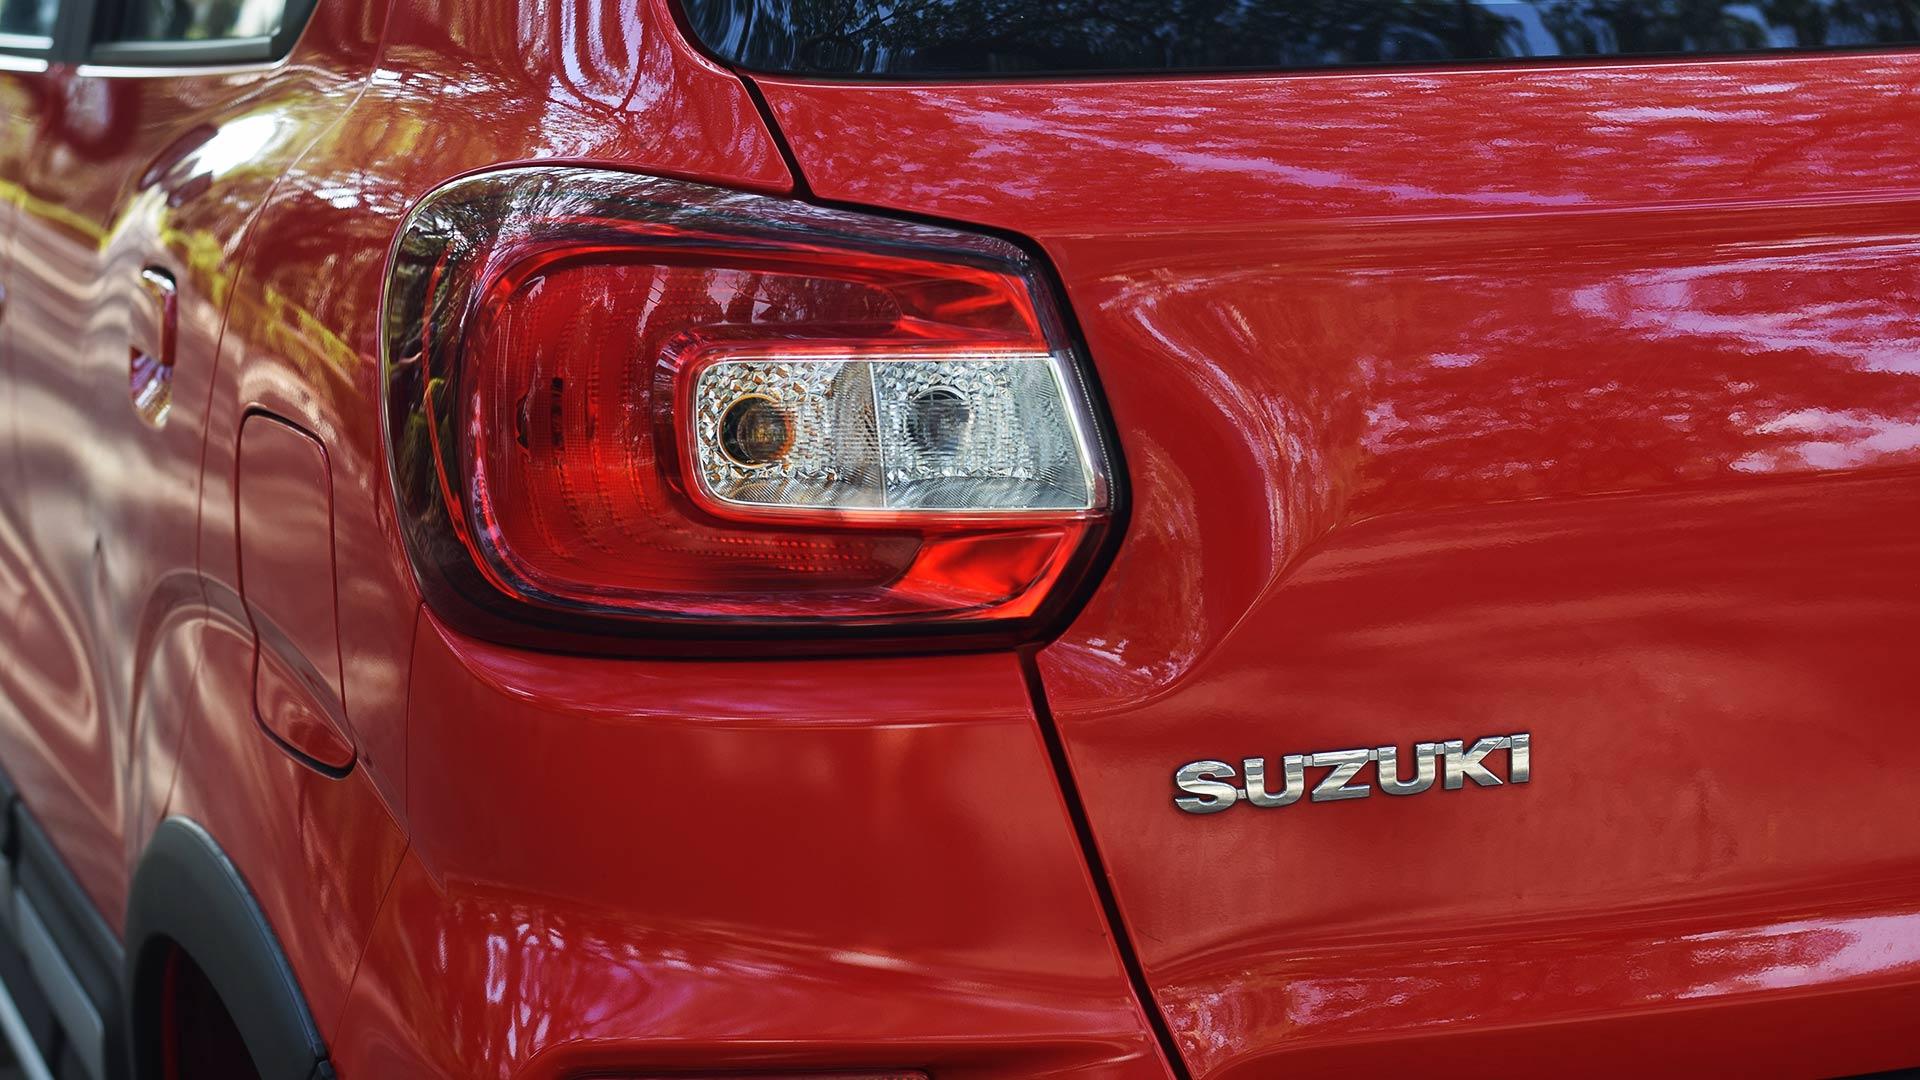 The Suzuki S-Presso tail light and emblem